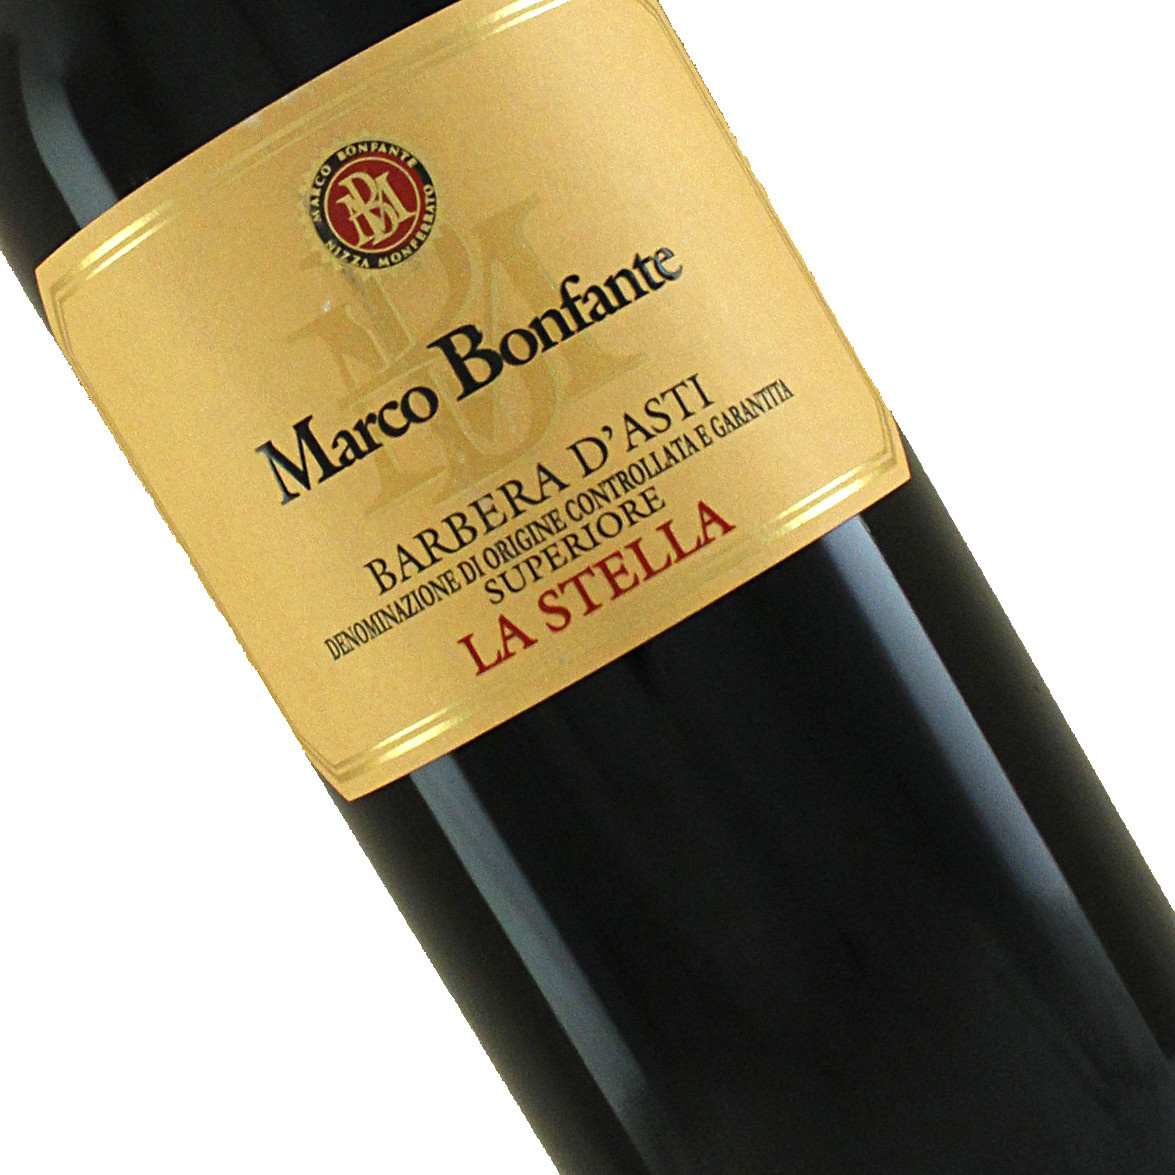 "Marco Bonfante 2017 Barbera d'Asti ""La Stella"", Piedmont, Italy"